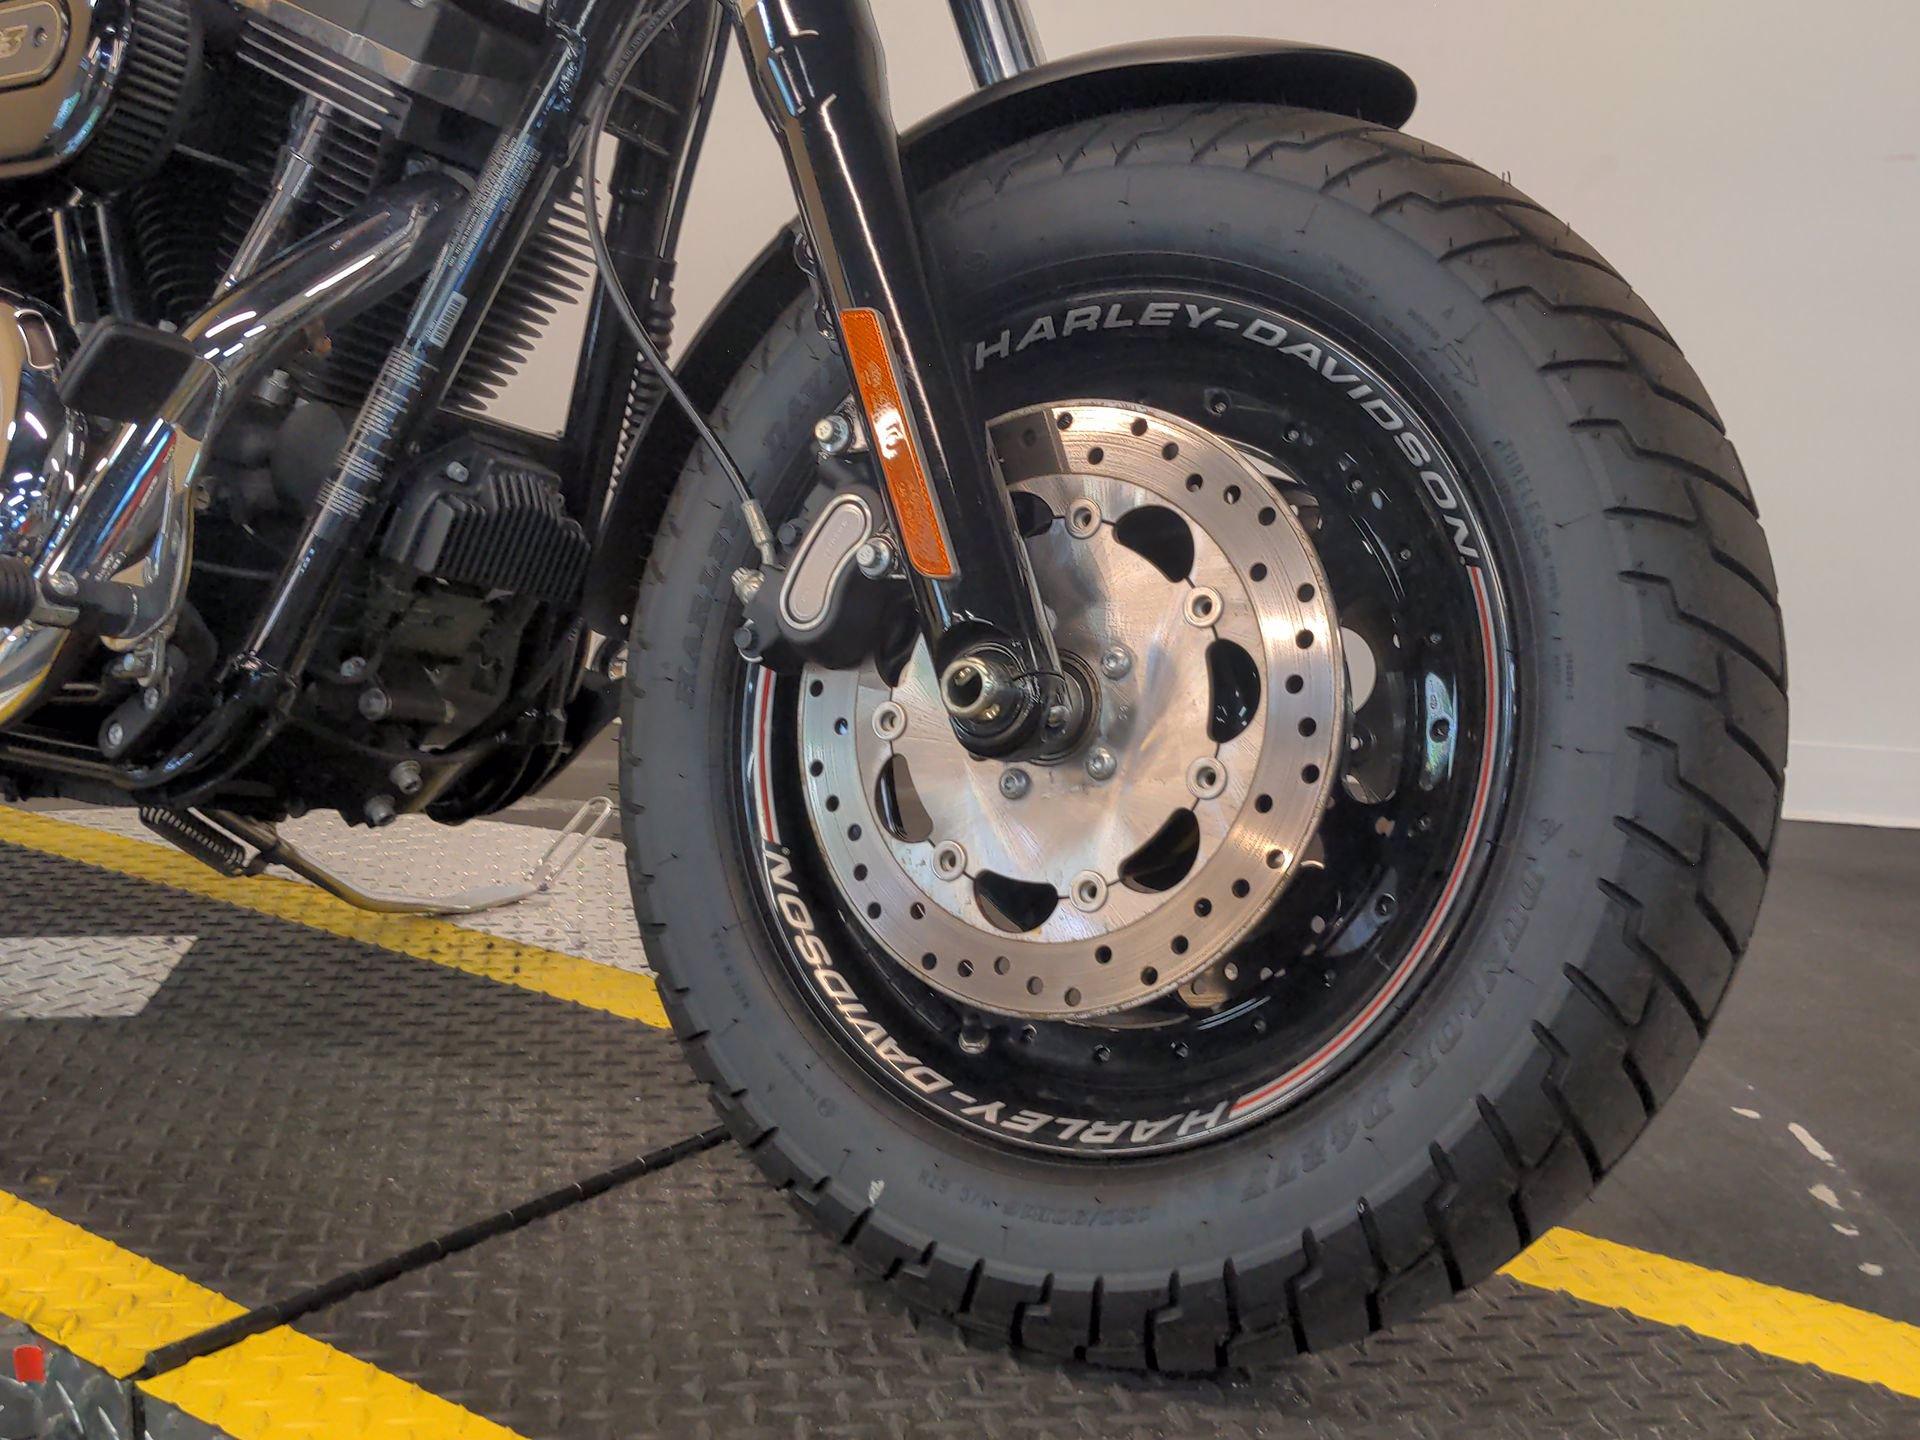 Pre-Owned 2016 Harley-Davidson Fat Bob FXDF